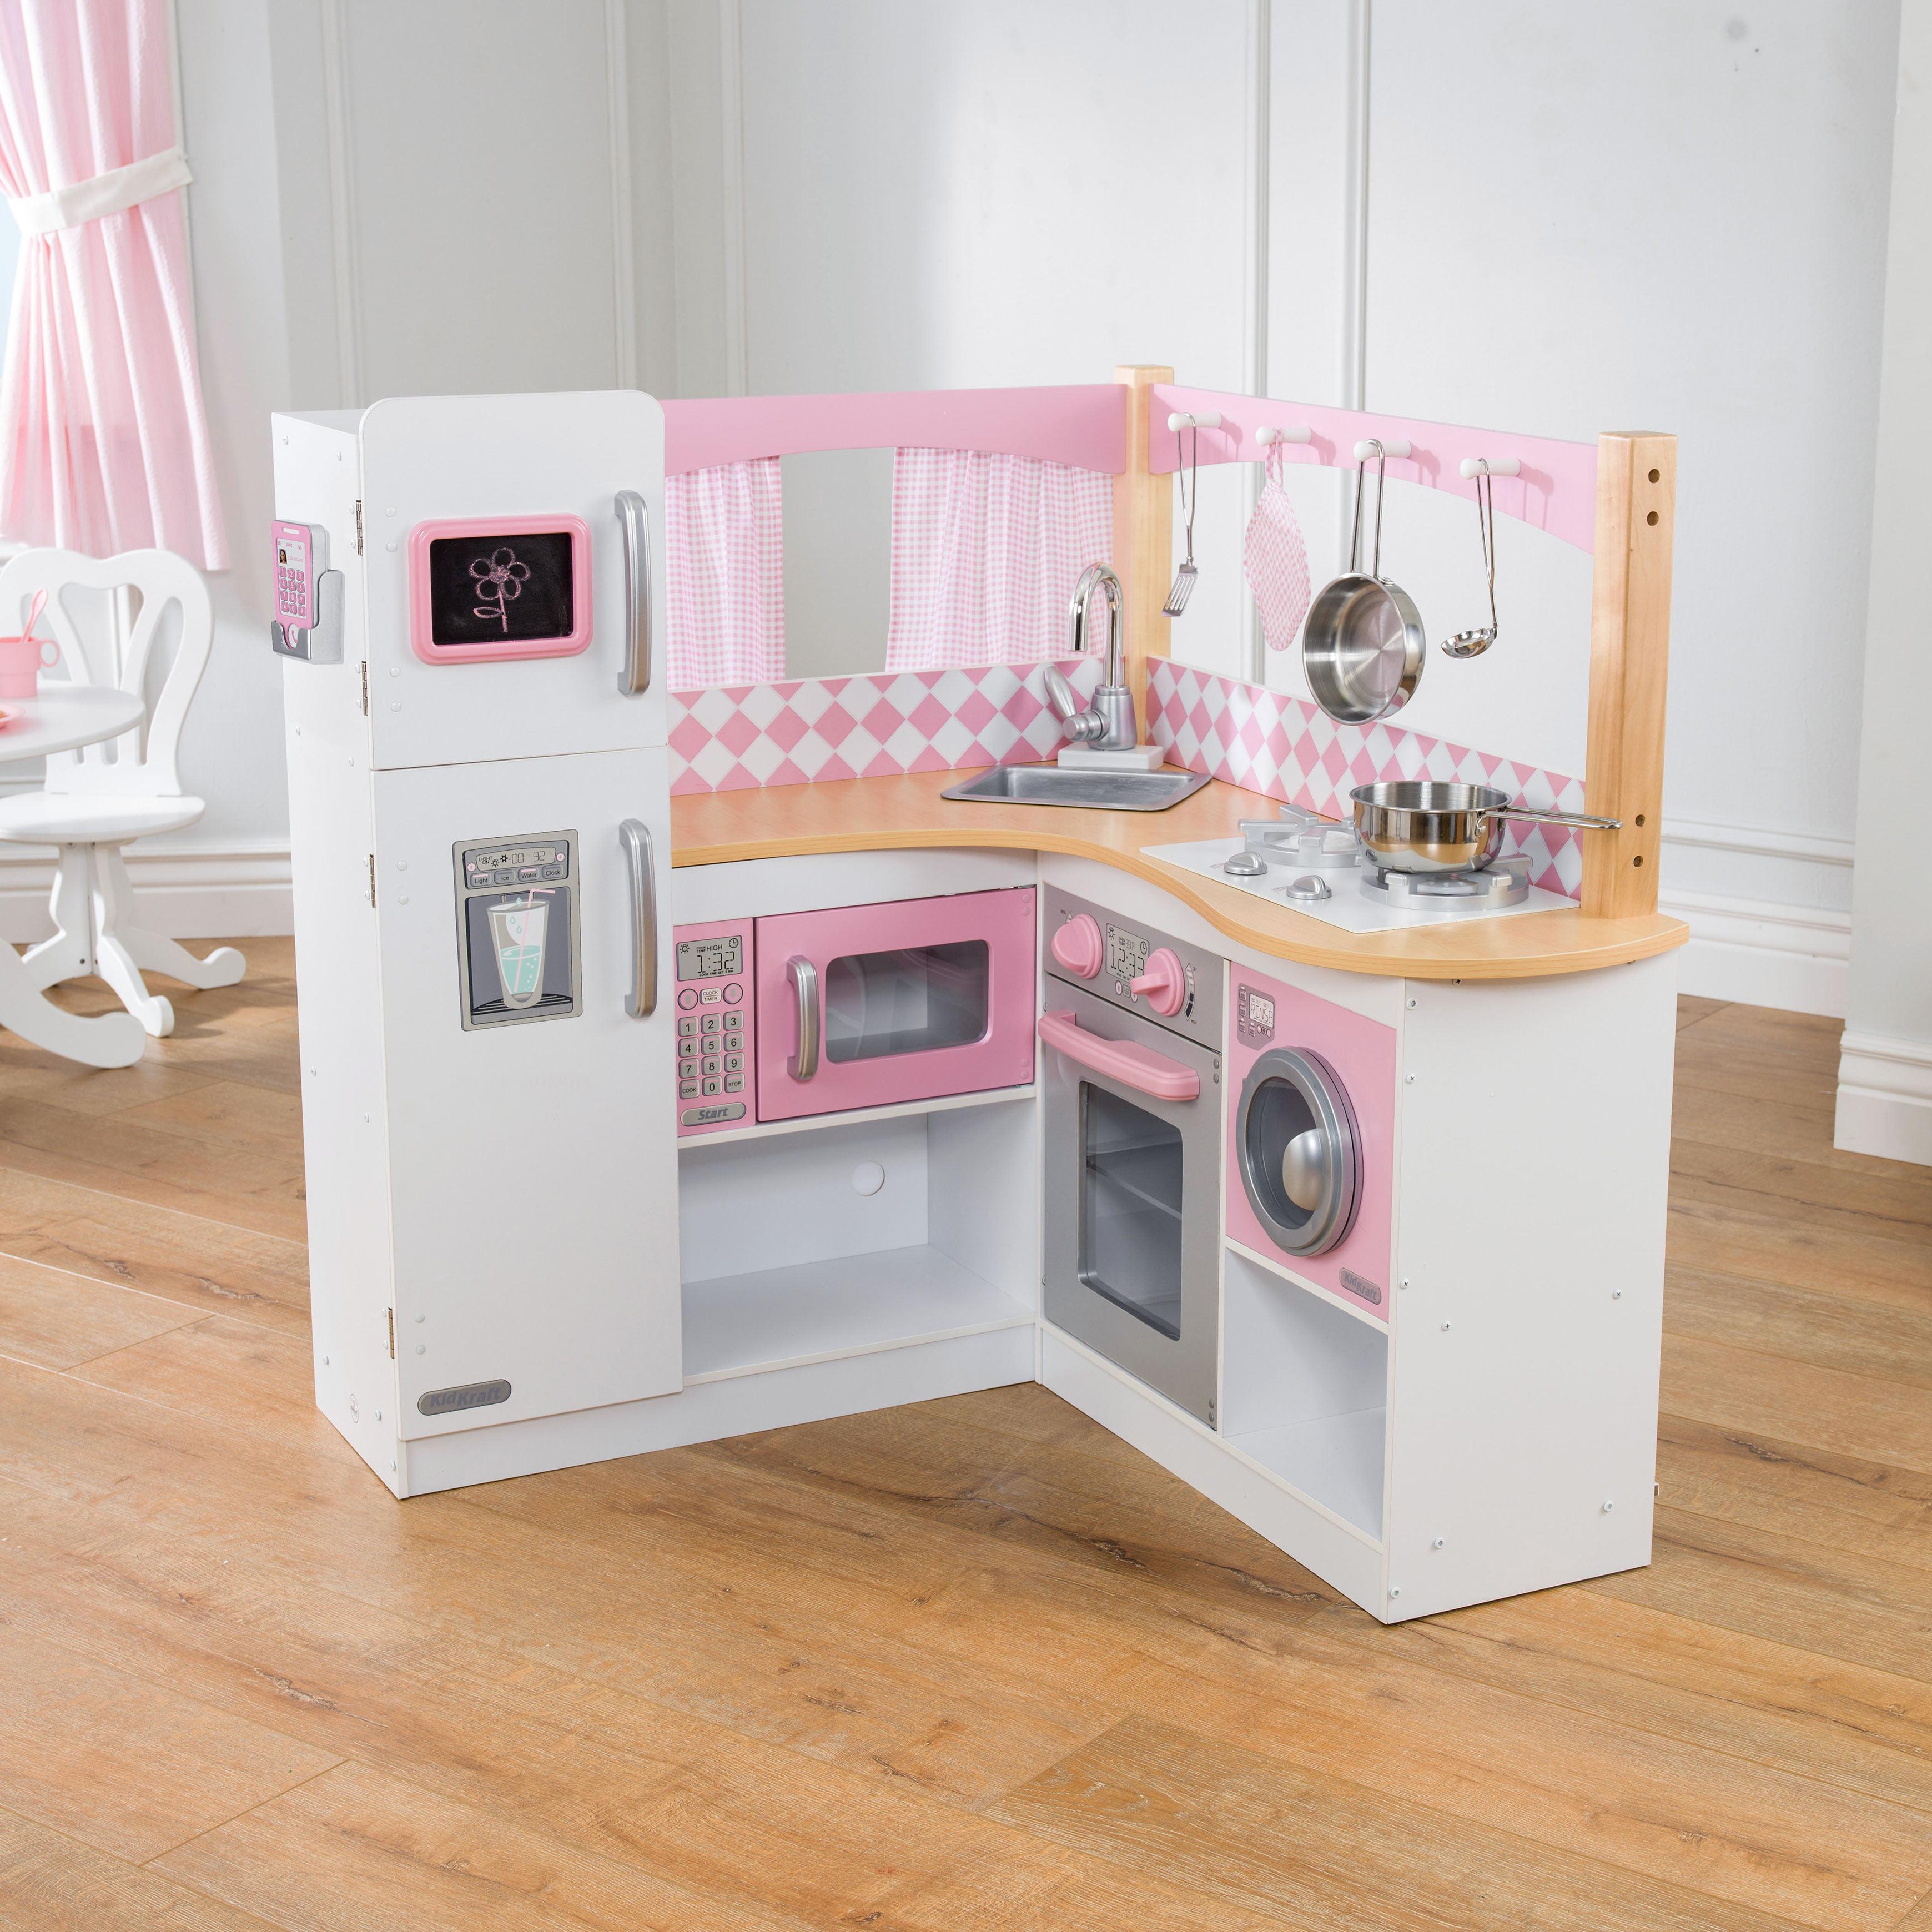 KidKraft Grand Gourmet Corner Play Kitchen - Walmart.com